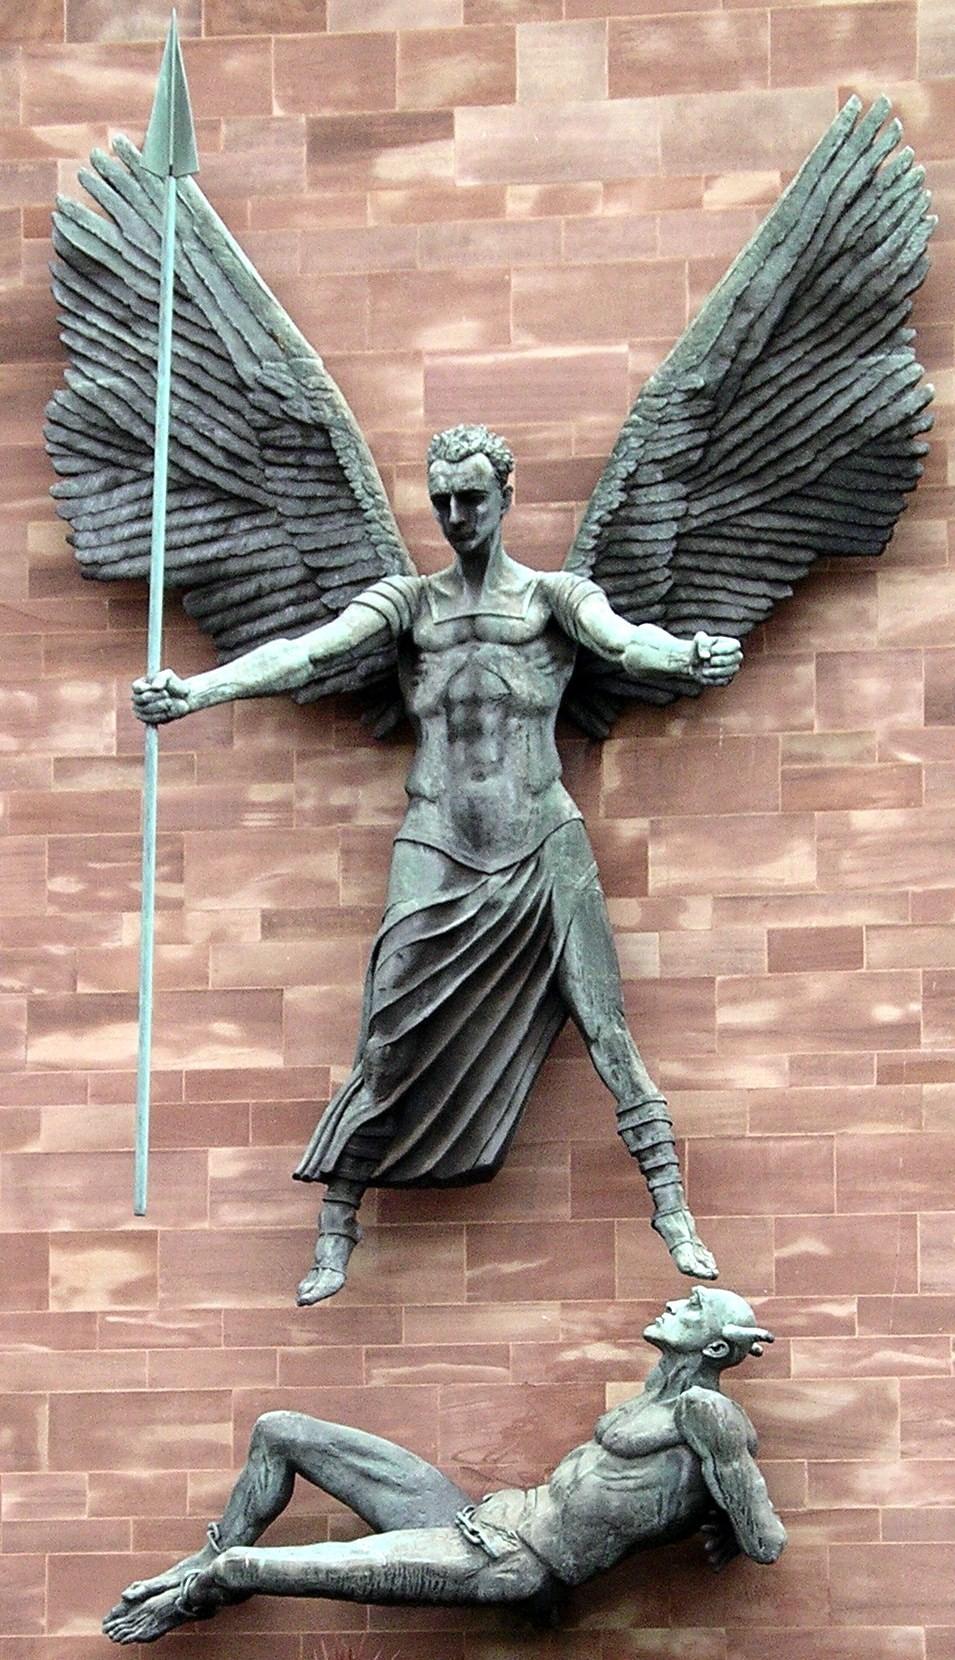 Devotion to St. Michael the Archangel